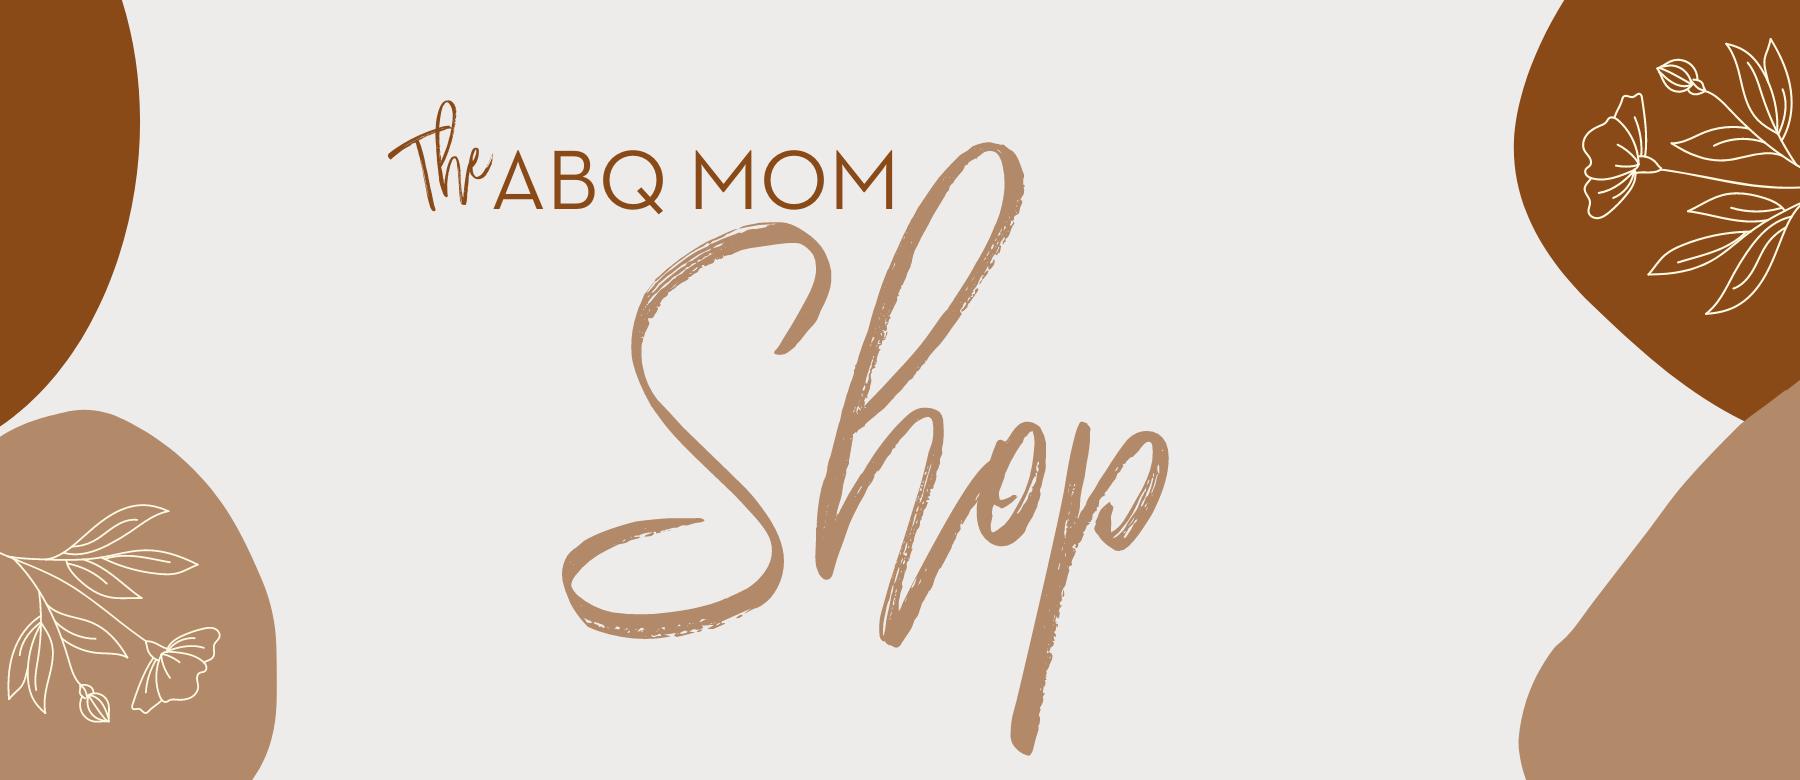 ABQ Mom Shop